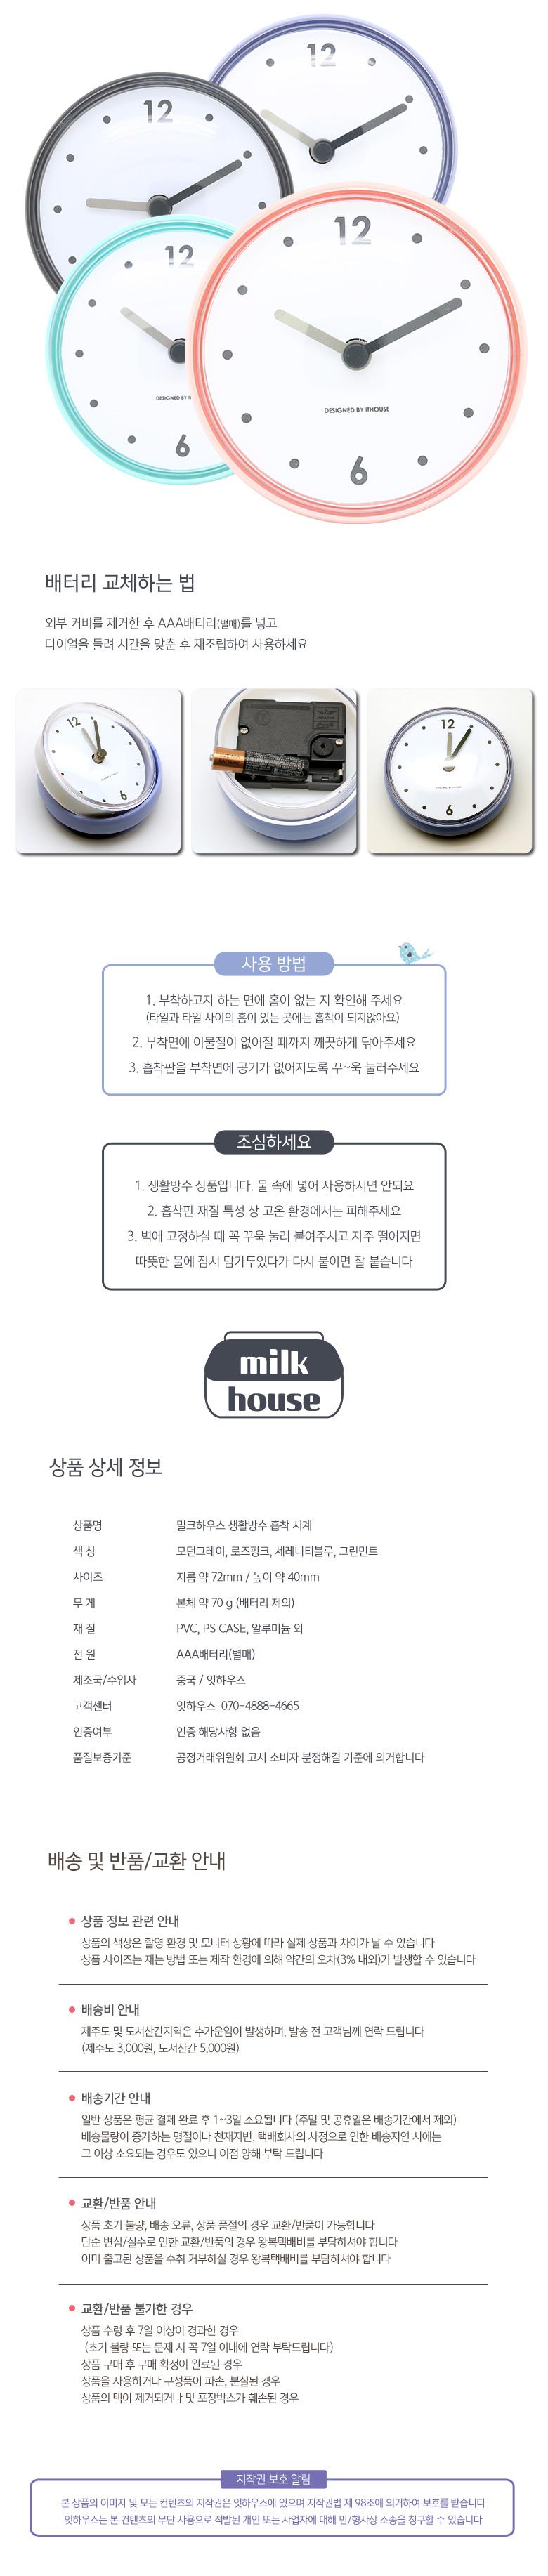 milk 밀크 욕실 방수시계 4 COLOR - 잇하우스, 6,900원, 벽시계, 흡착시계